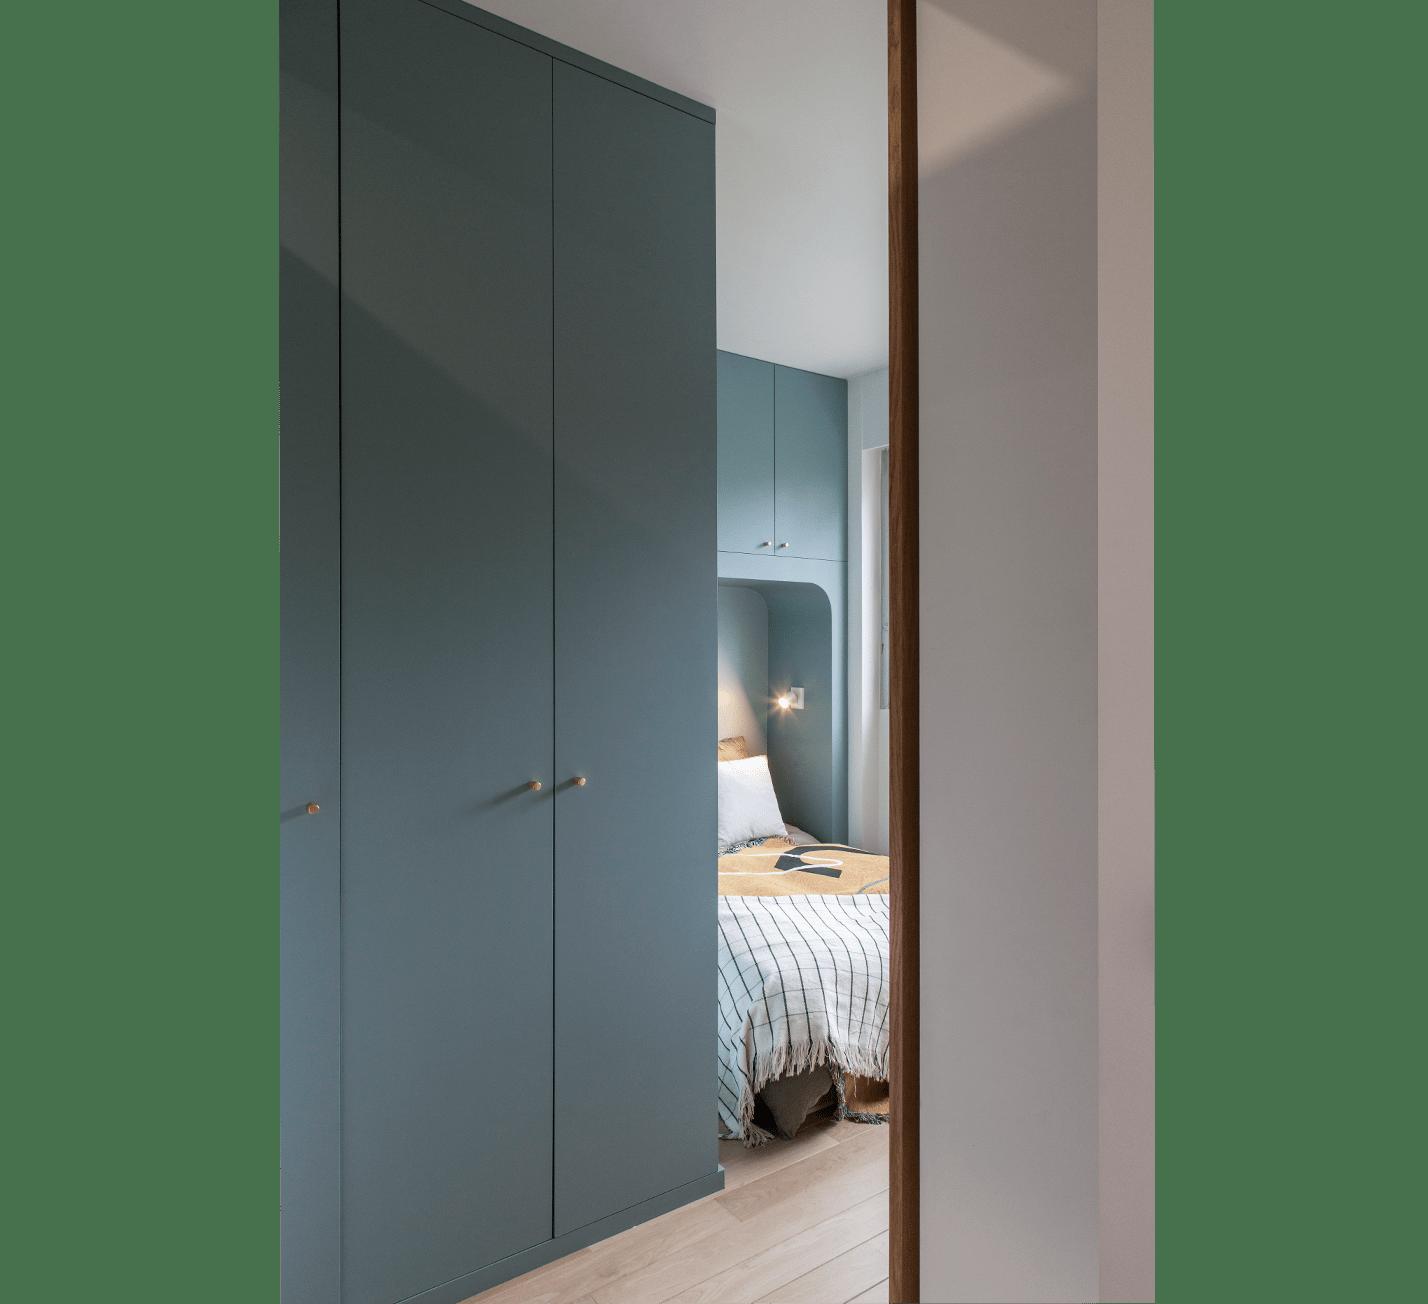 Projet-Albert-Atelier-Steve-Pauline-Borgia-Architecte-interieur-03-min-1